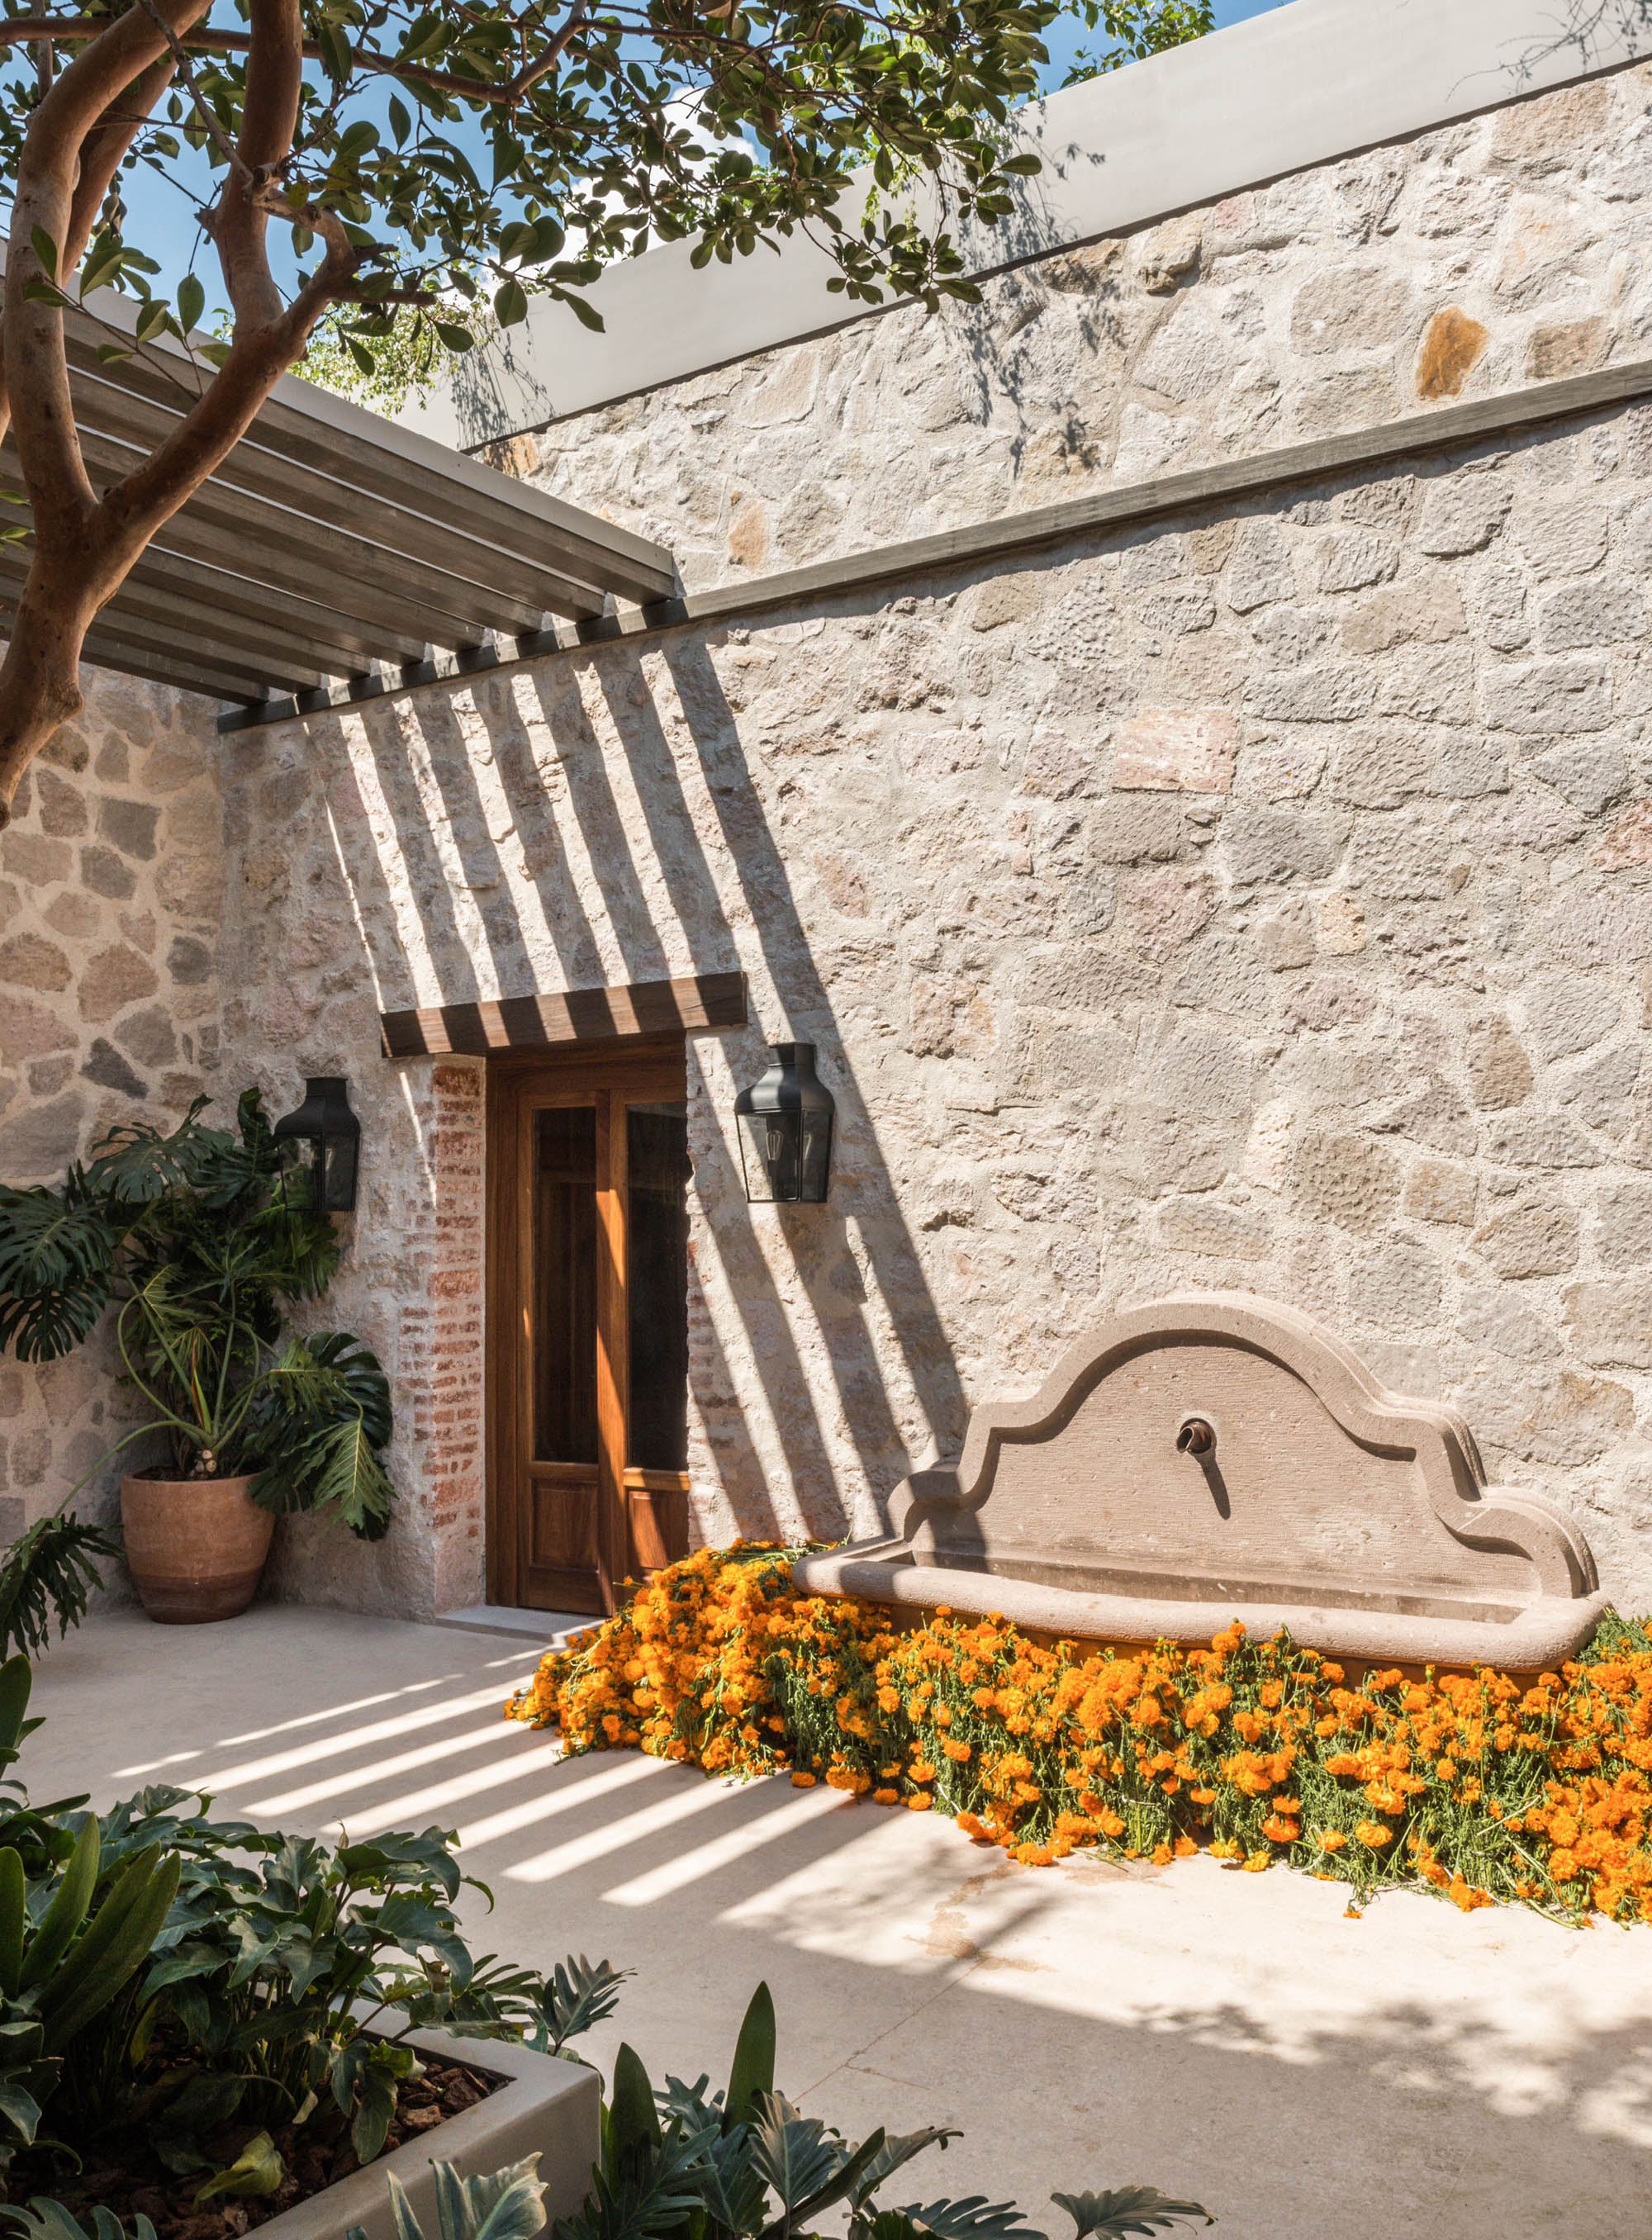 luis_laplace-Casa_Michelena_Morelia-10